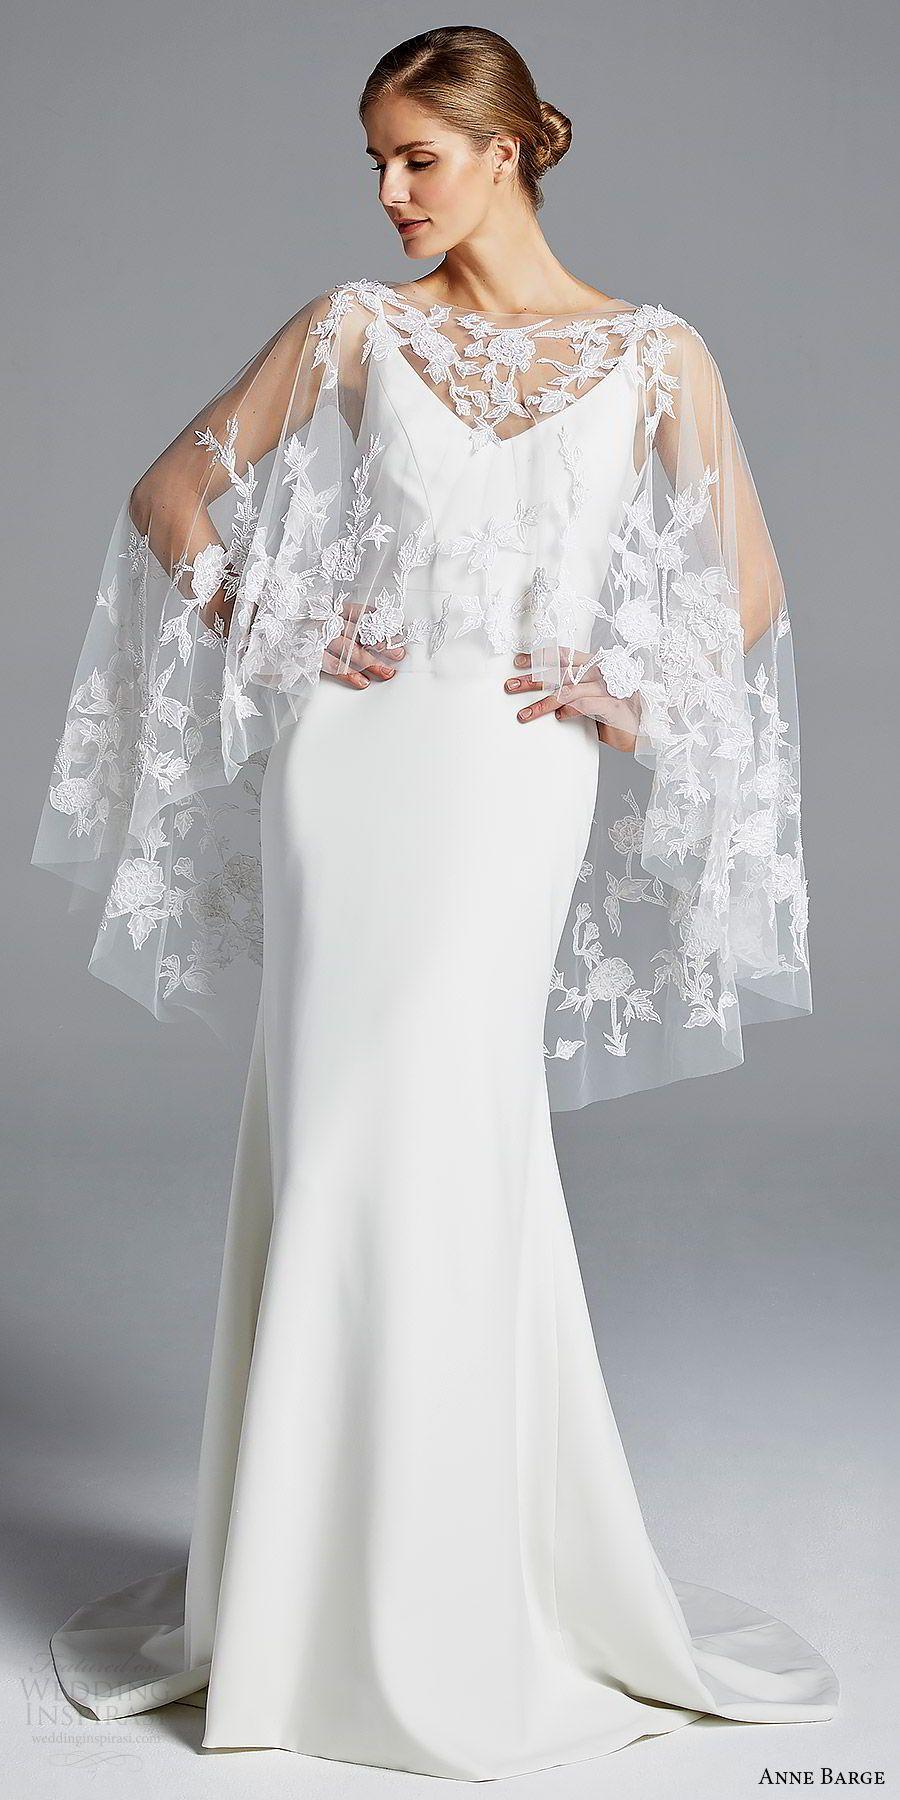 Anne barge spring wedding dresses wedding pinterest anne